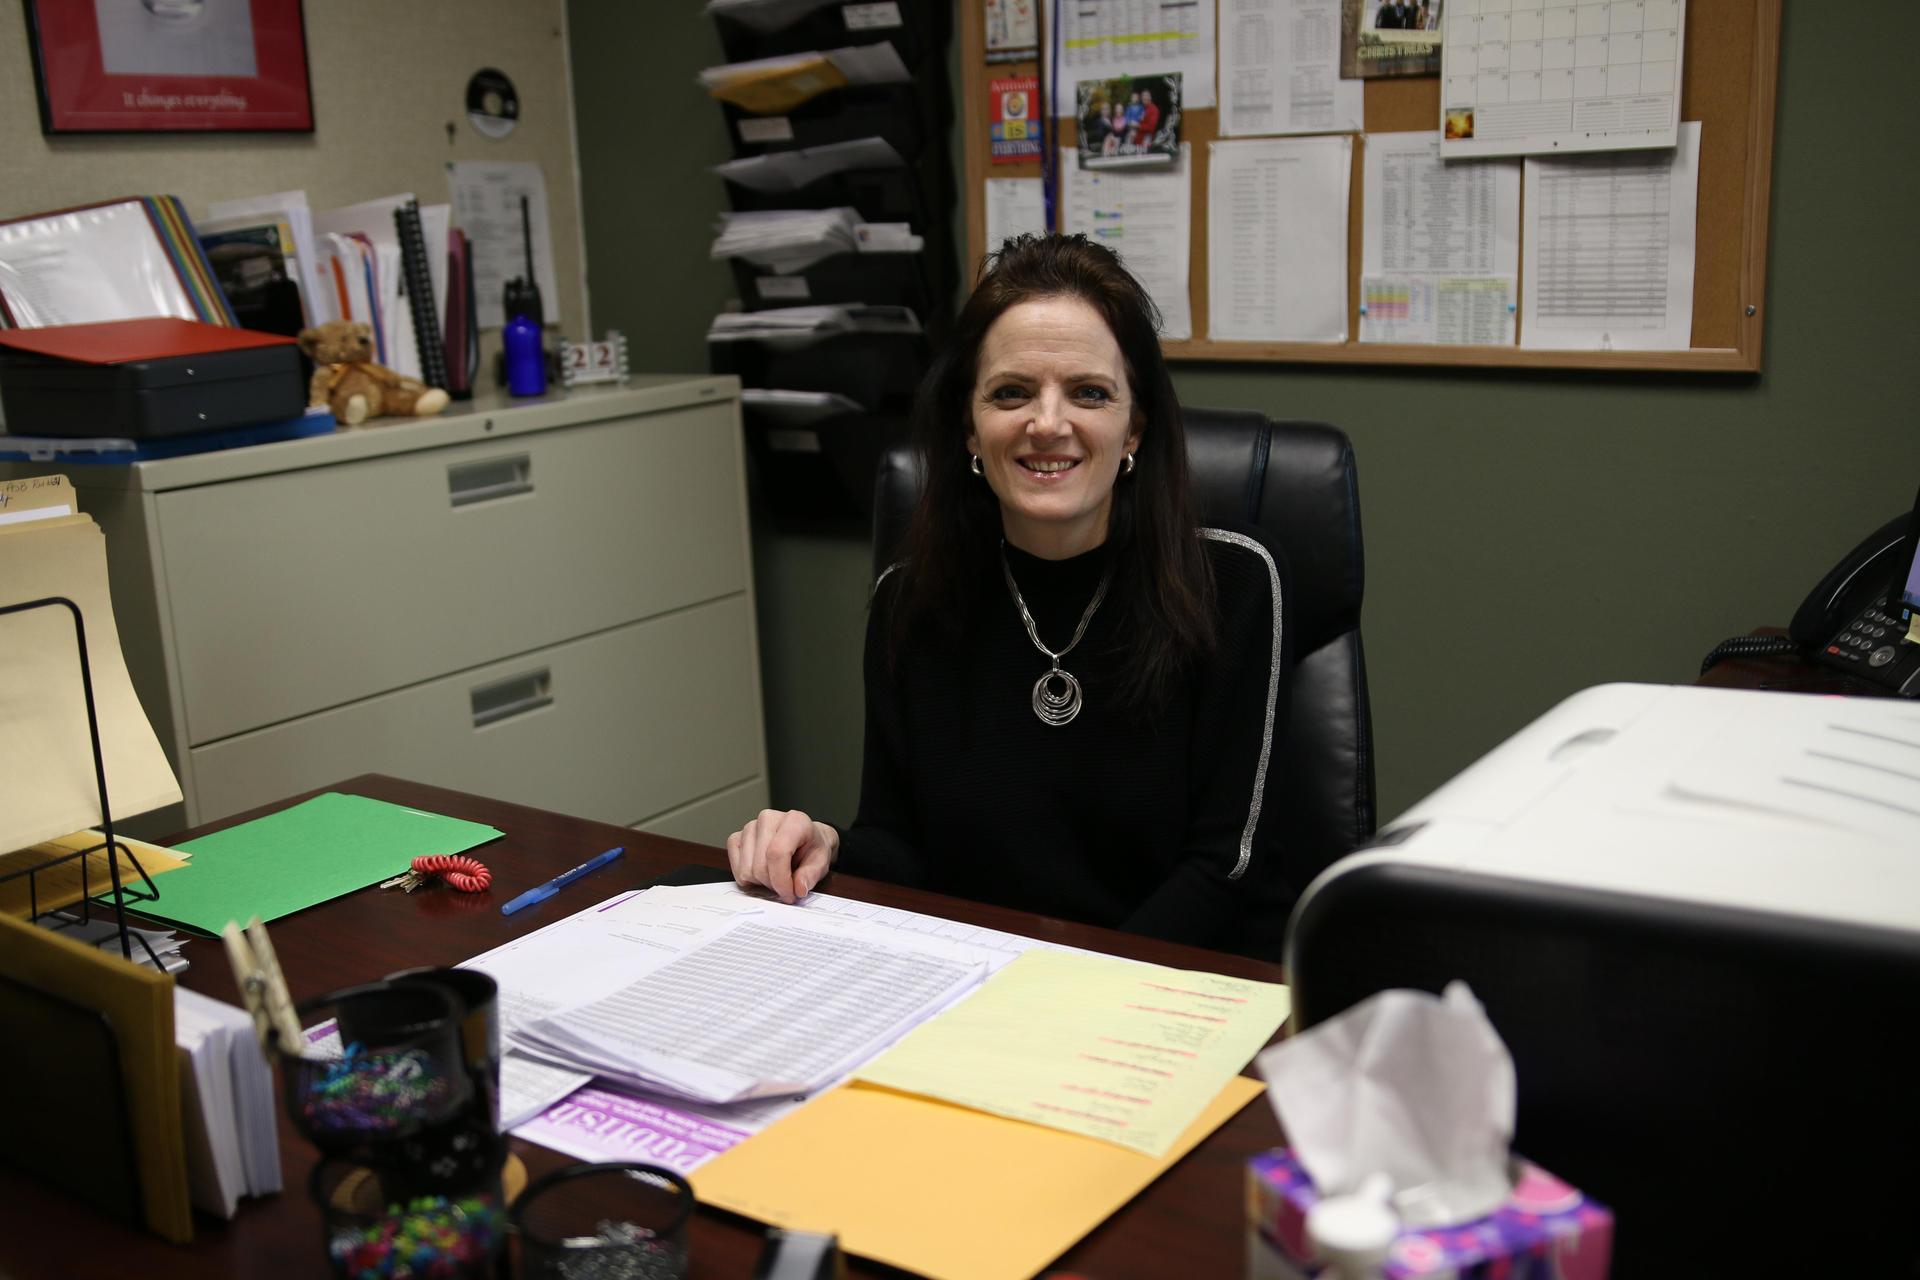 QHS Administrative Assistant